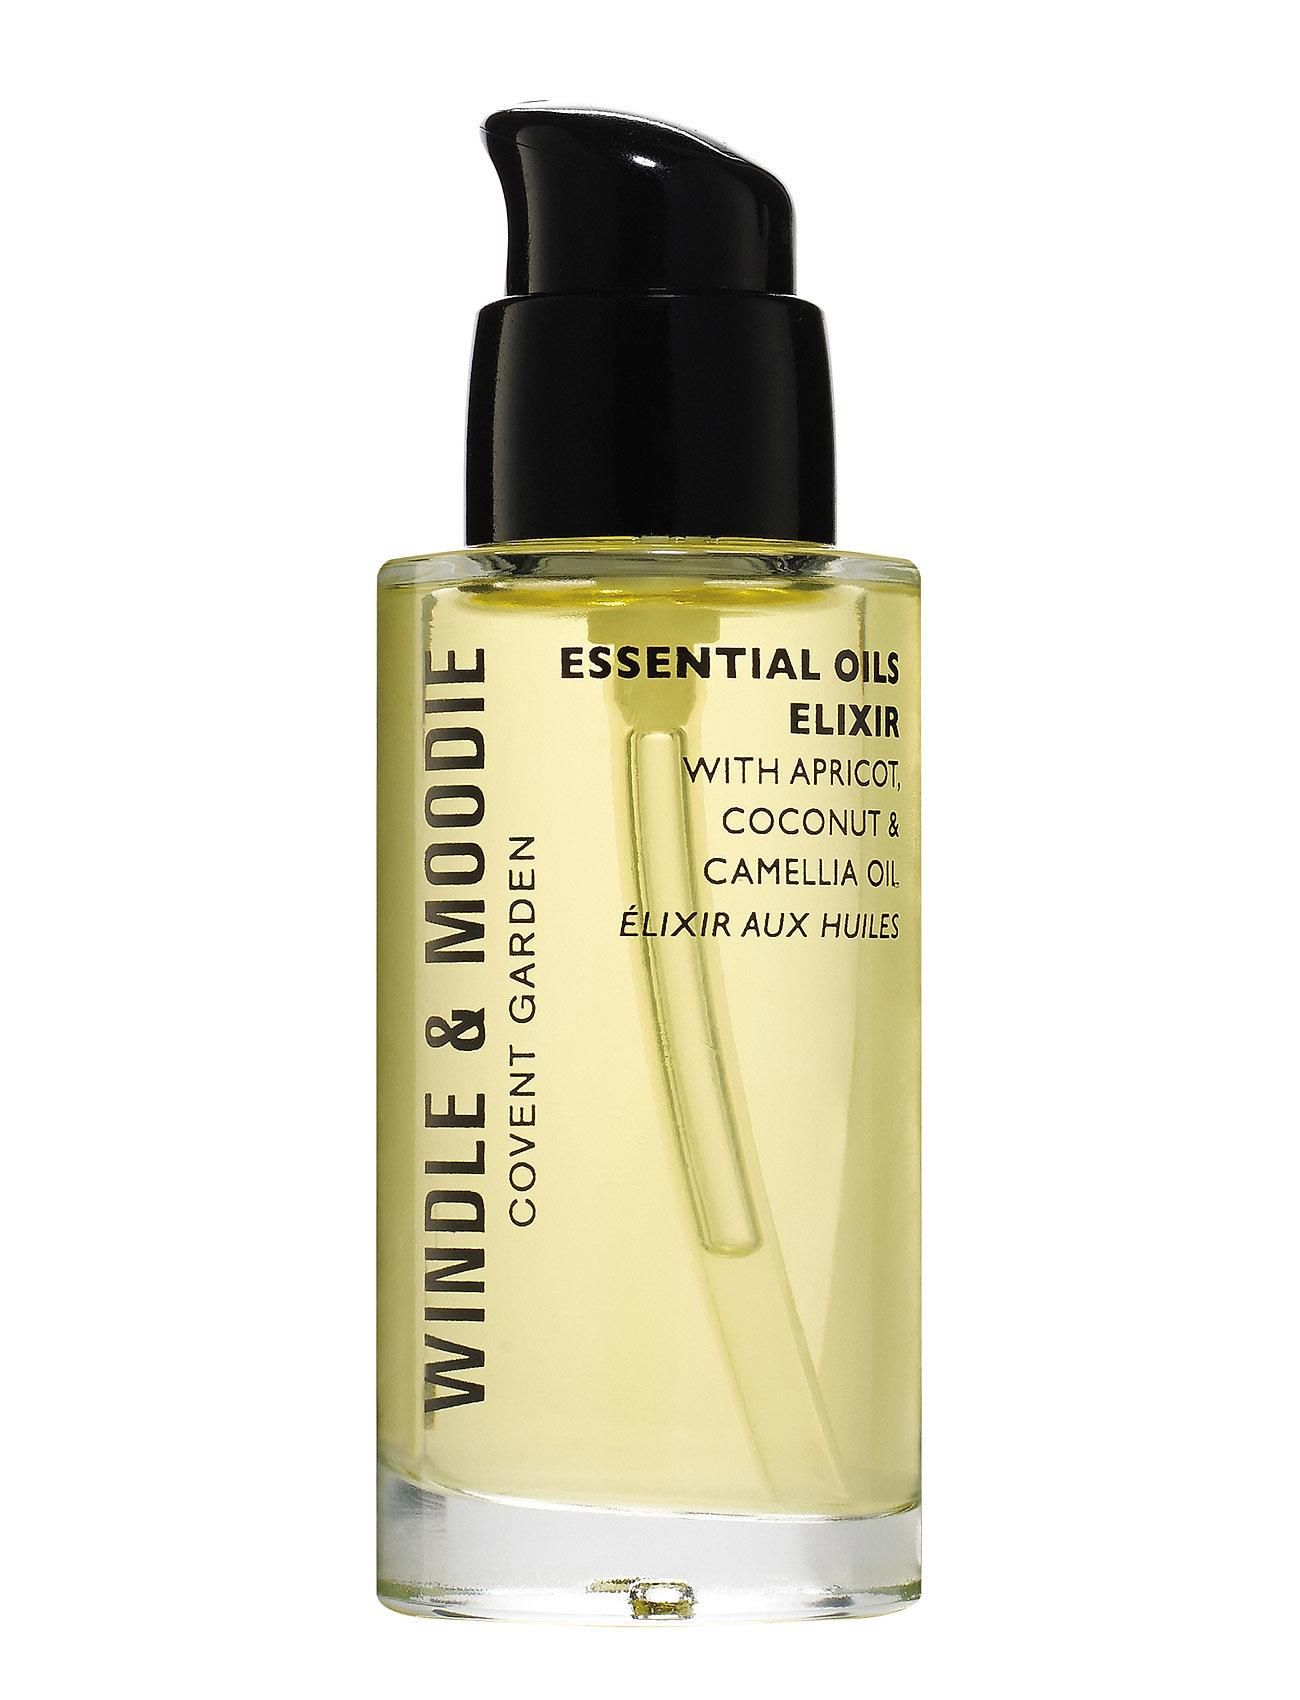 windle & moodie Essential oils elixir fra boozt.com dk